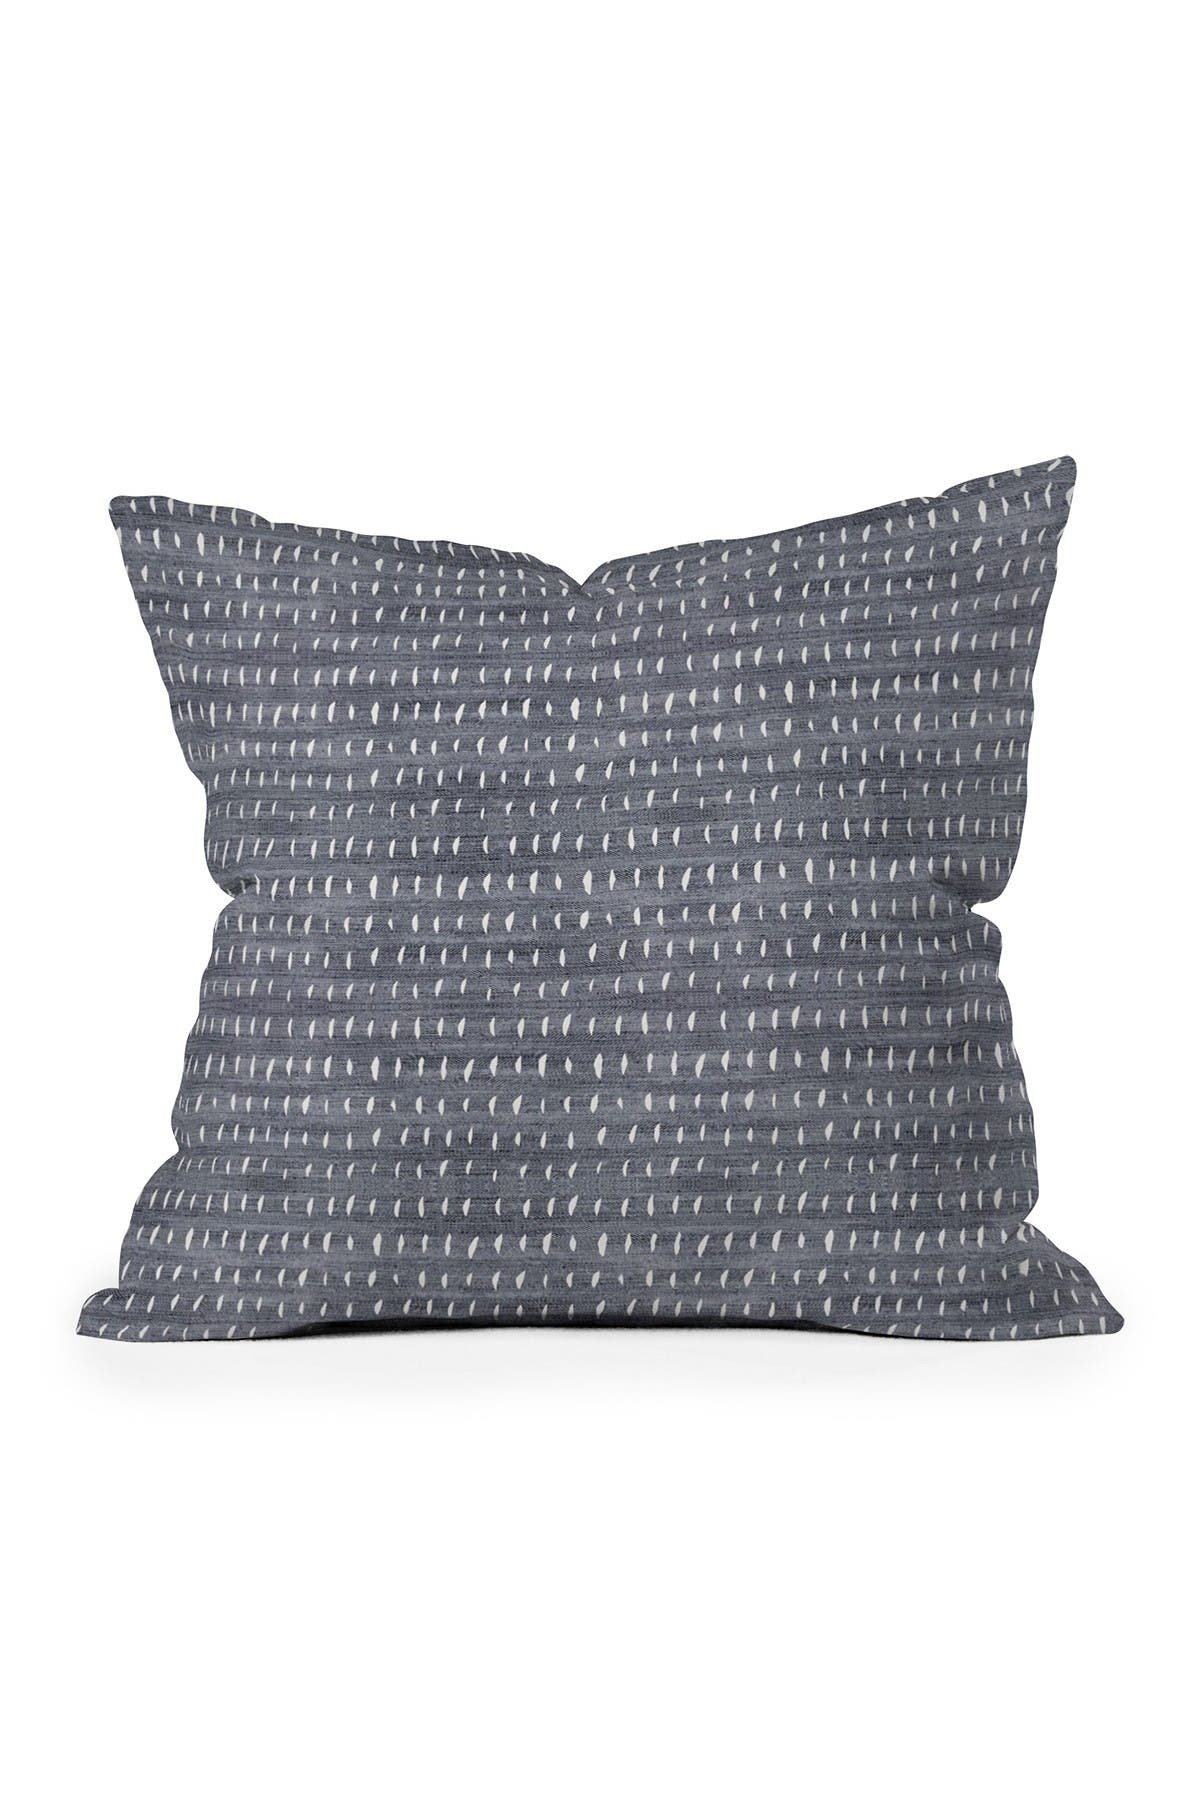 Image of Deny Designs Holli Zollinger Bogo Rain Light Square Throw Pillow